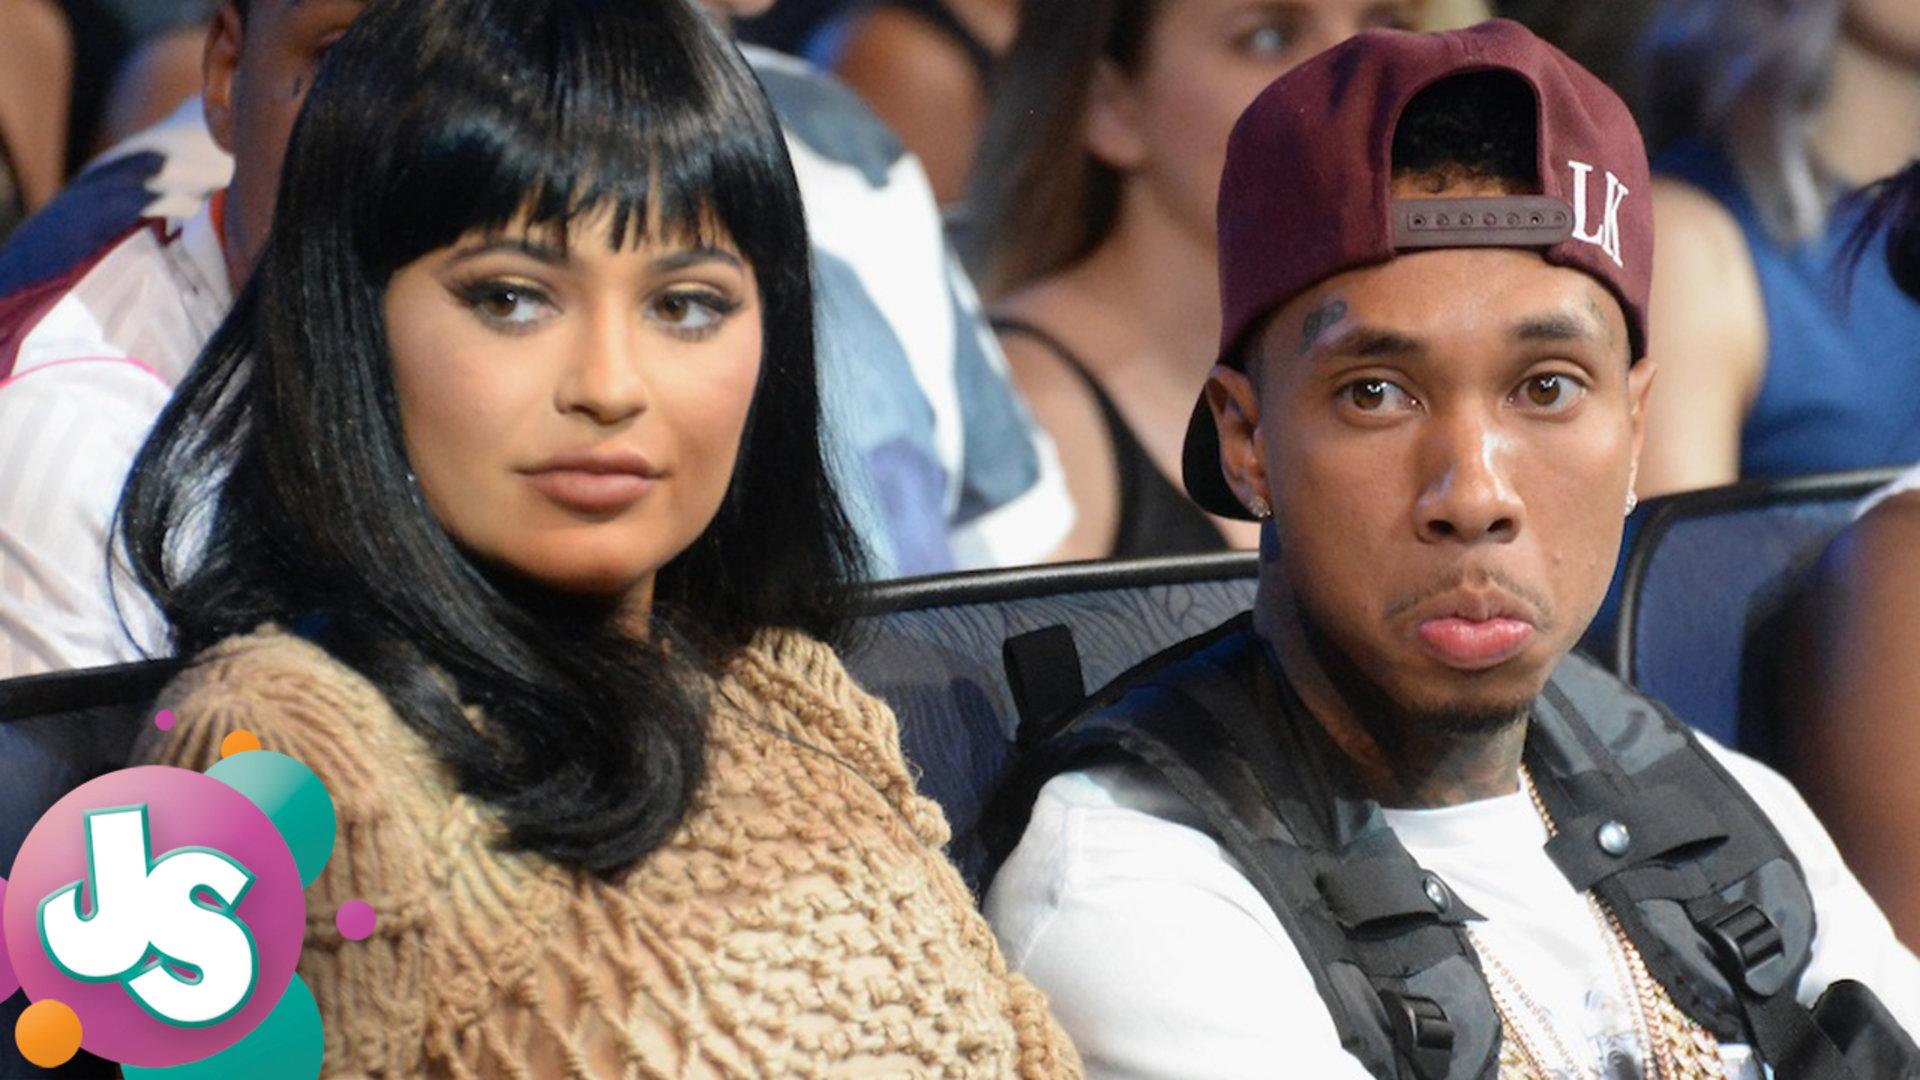 Did Kylie Jenner RUIN Tyga's Rap Career? -JS